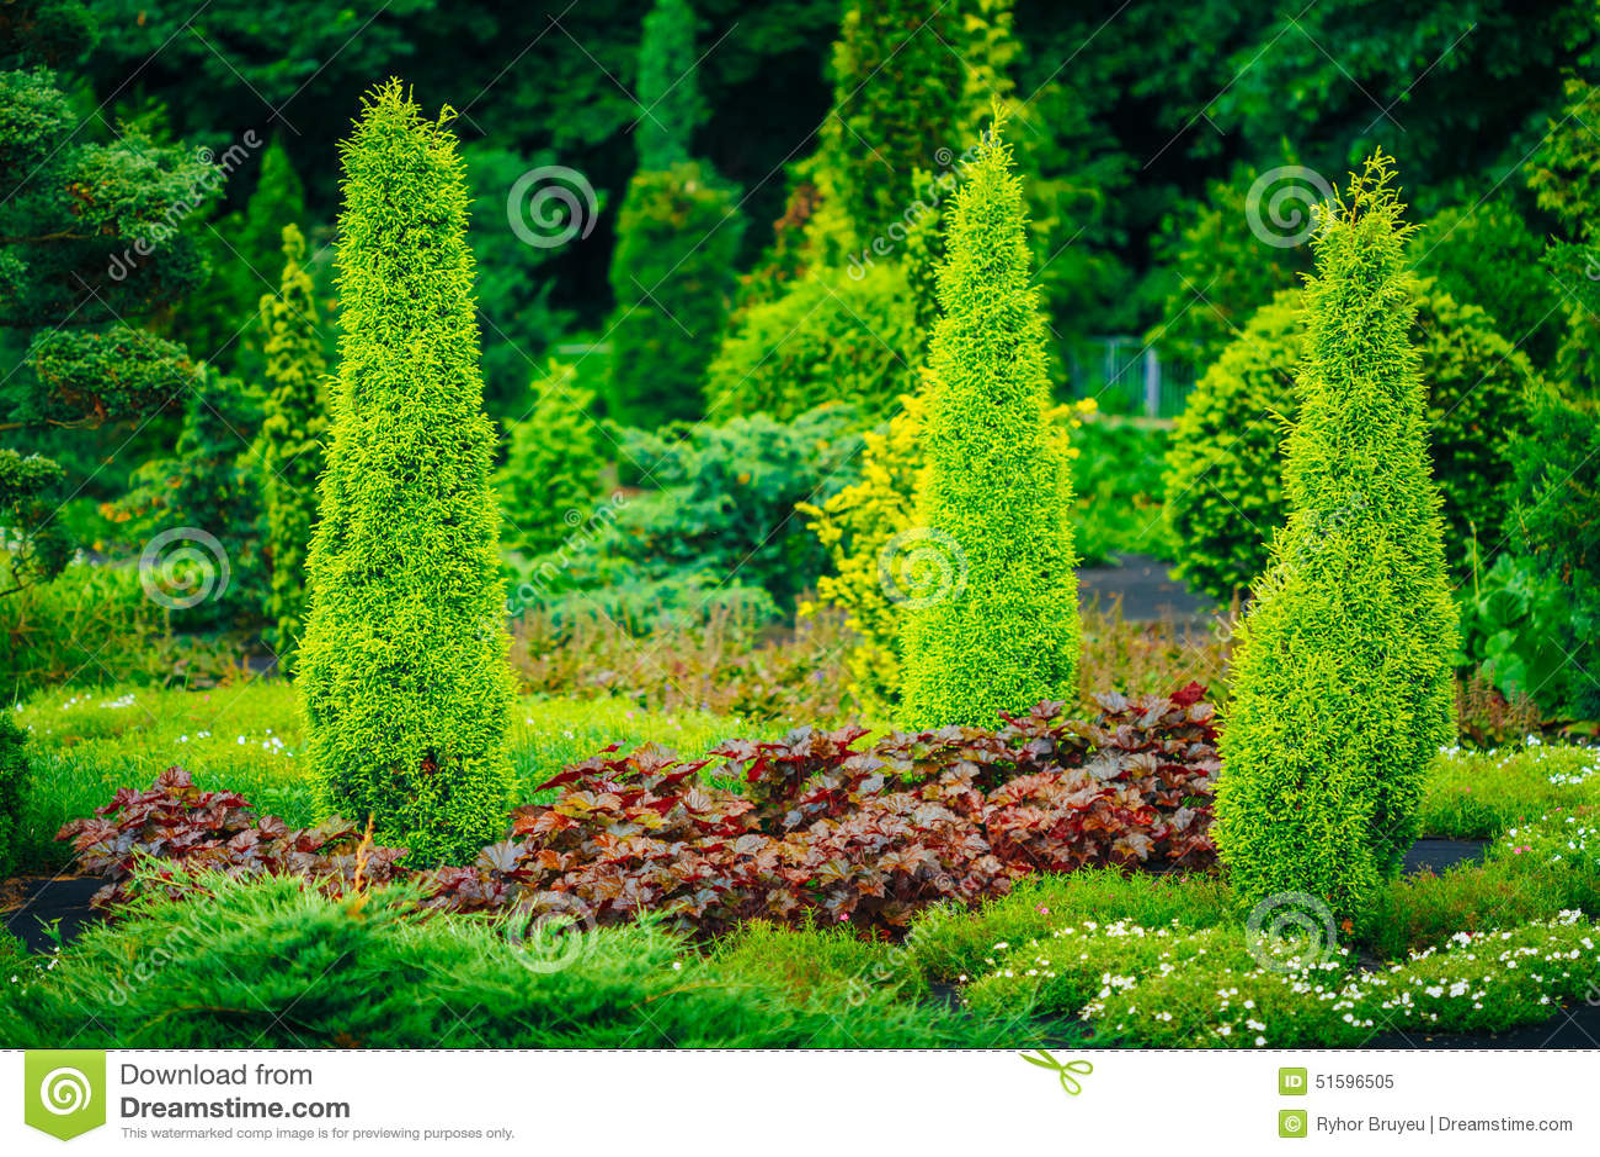 Garden Landscaping Design  Flower Bed  Green Trees Royalty Free Stock Photo. Garden Landscaping Design  Flower Bed  Green Trees Stock Photo